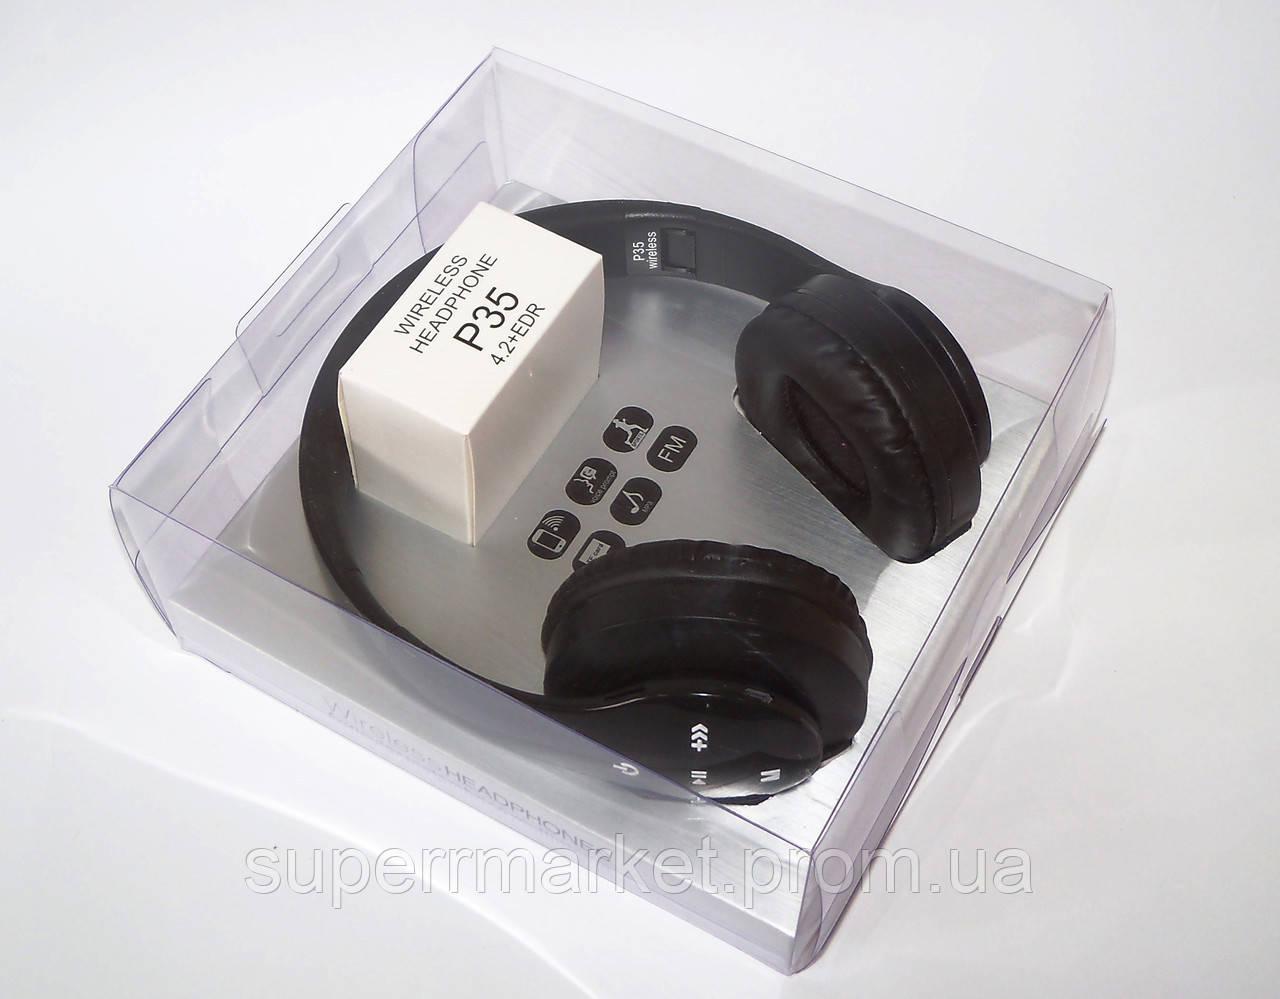 Беспроводные наушники P35 WIRELESS HEADPHONE  FM MP3 SD микрофон  BLACK